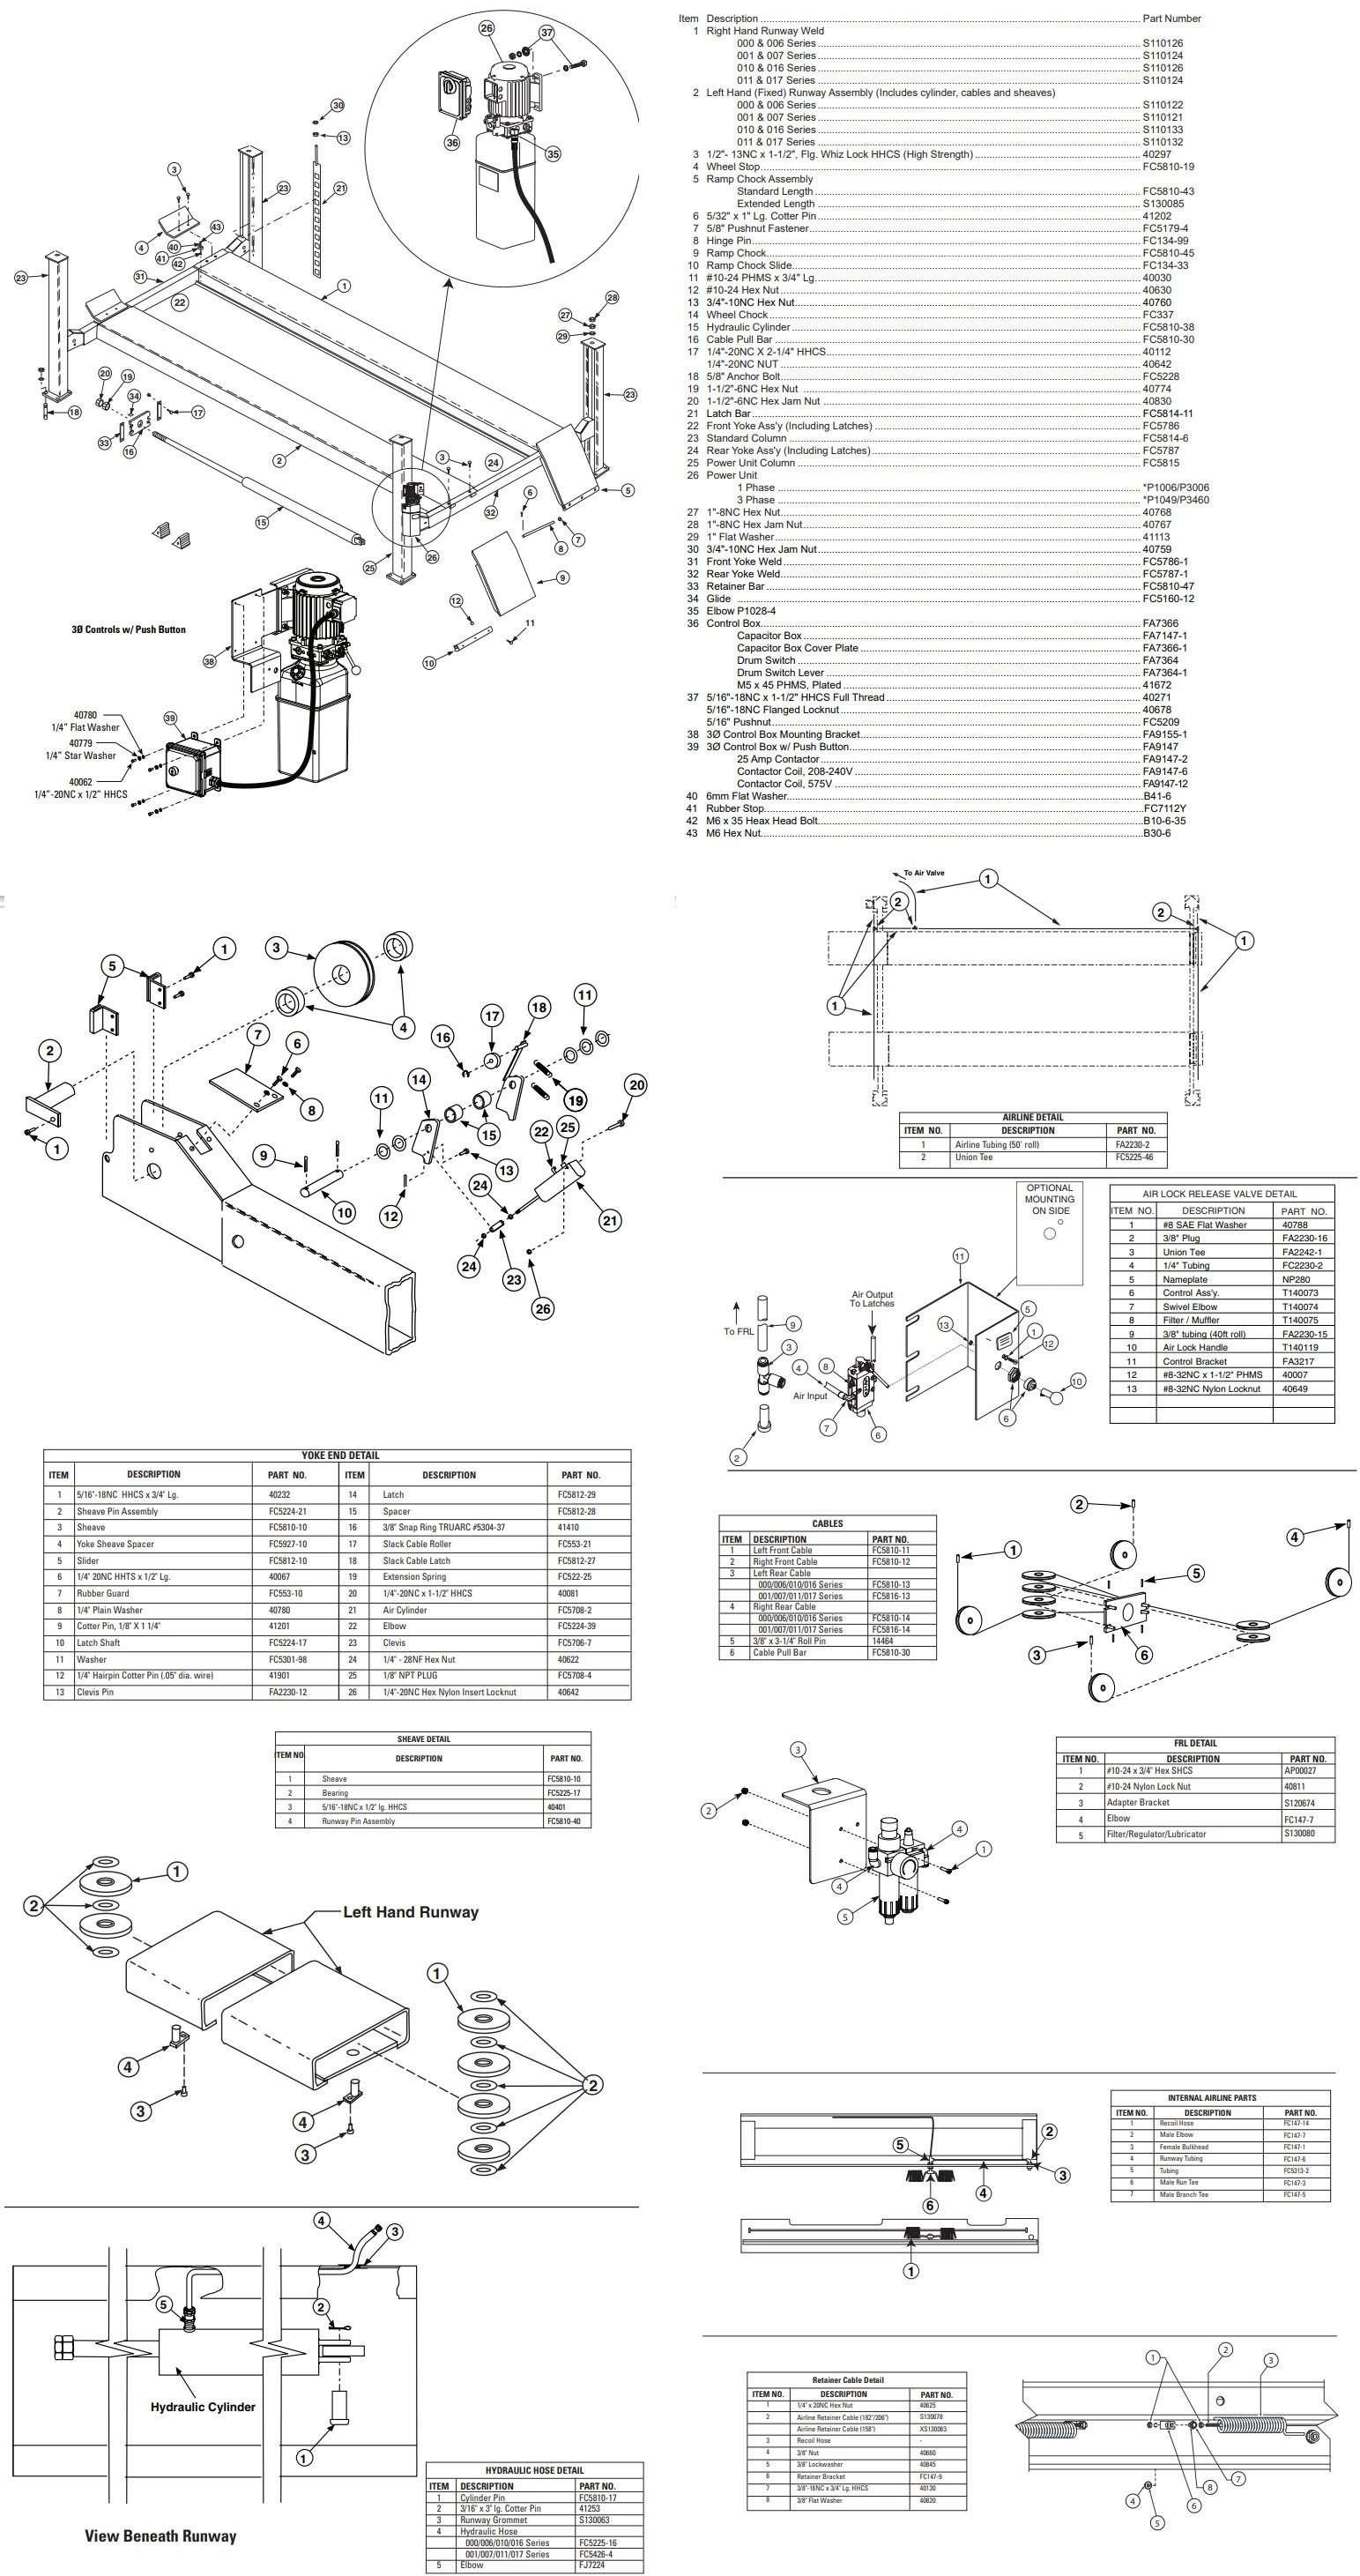 Rotary 4-post AR18 Parts Manual